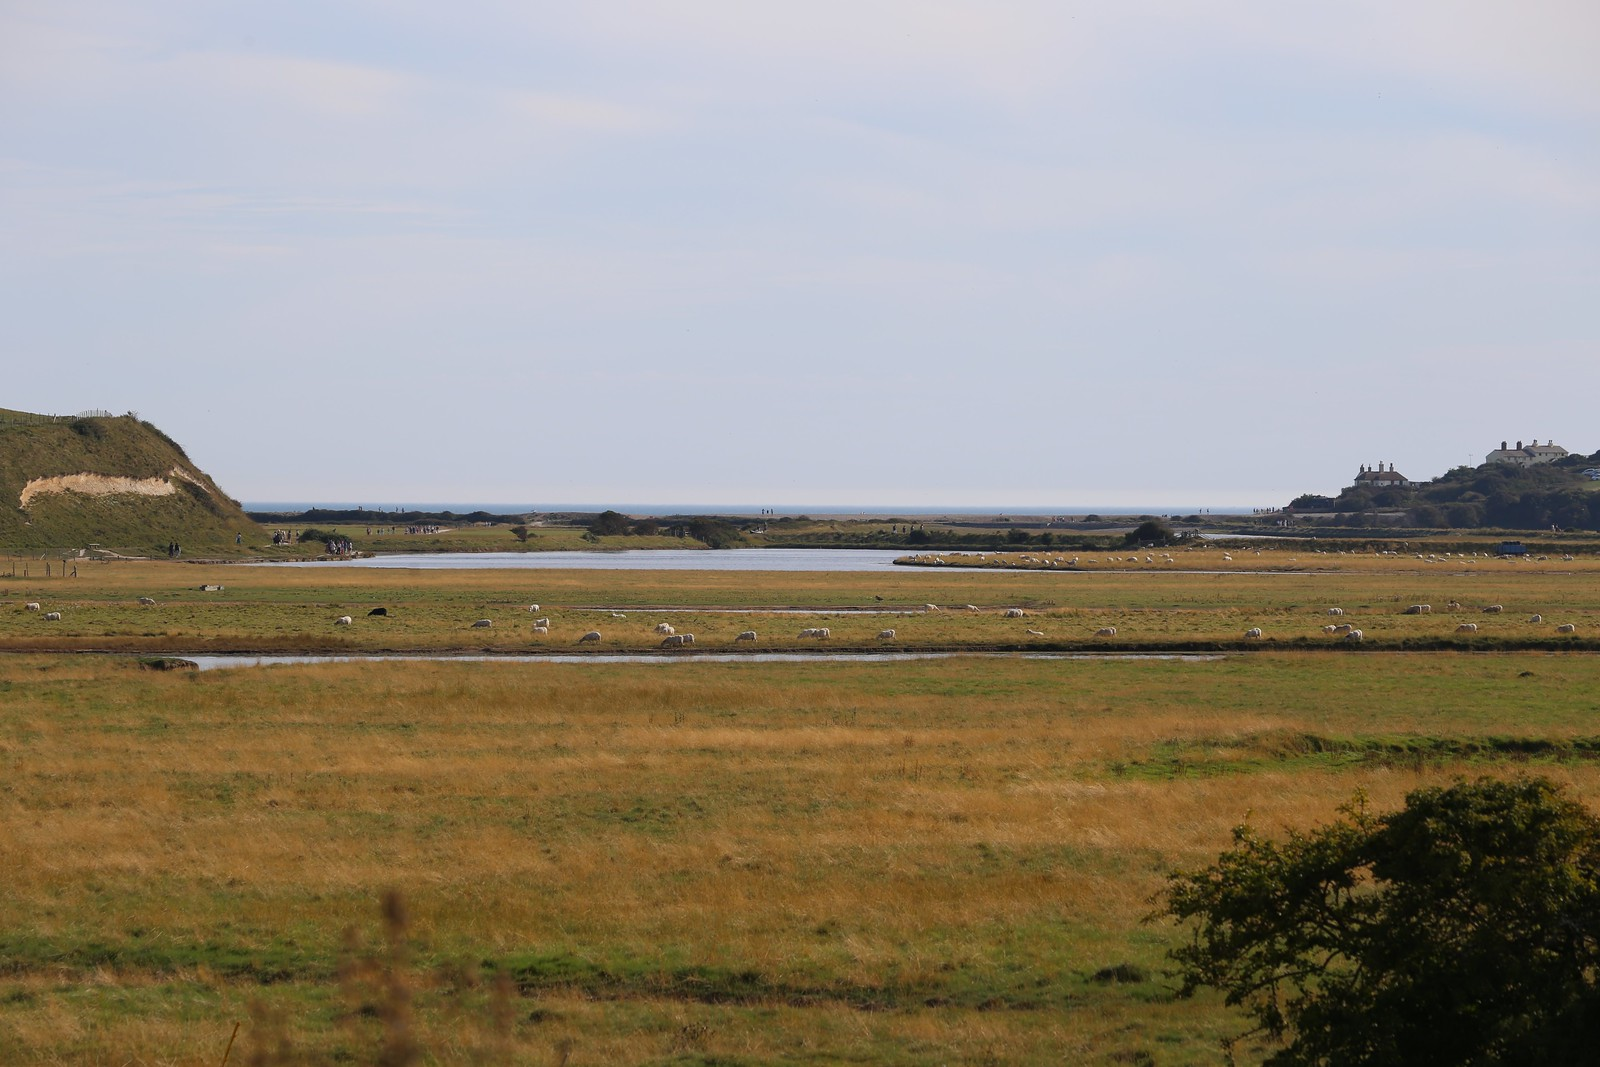 Towards Cuckmere Haven